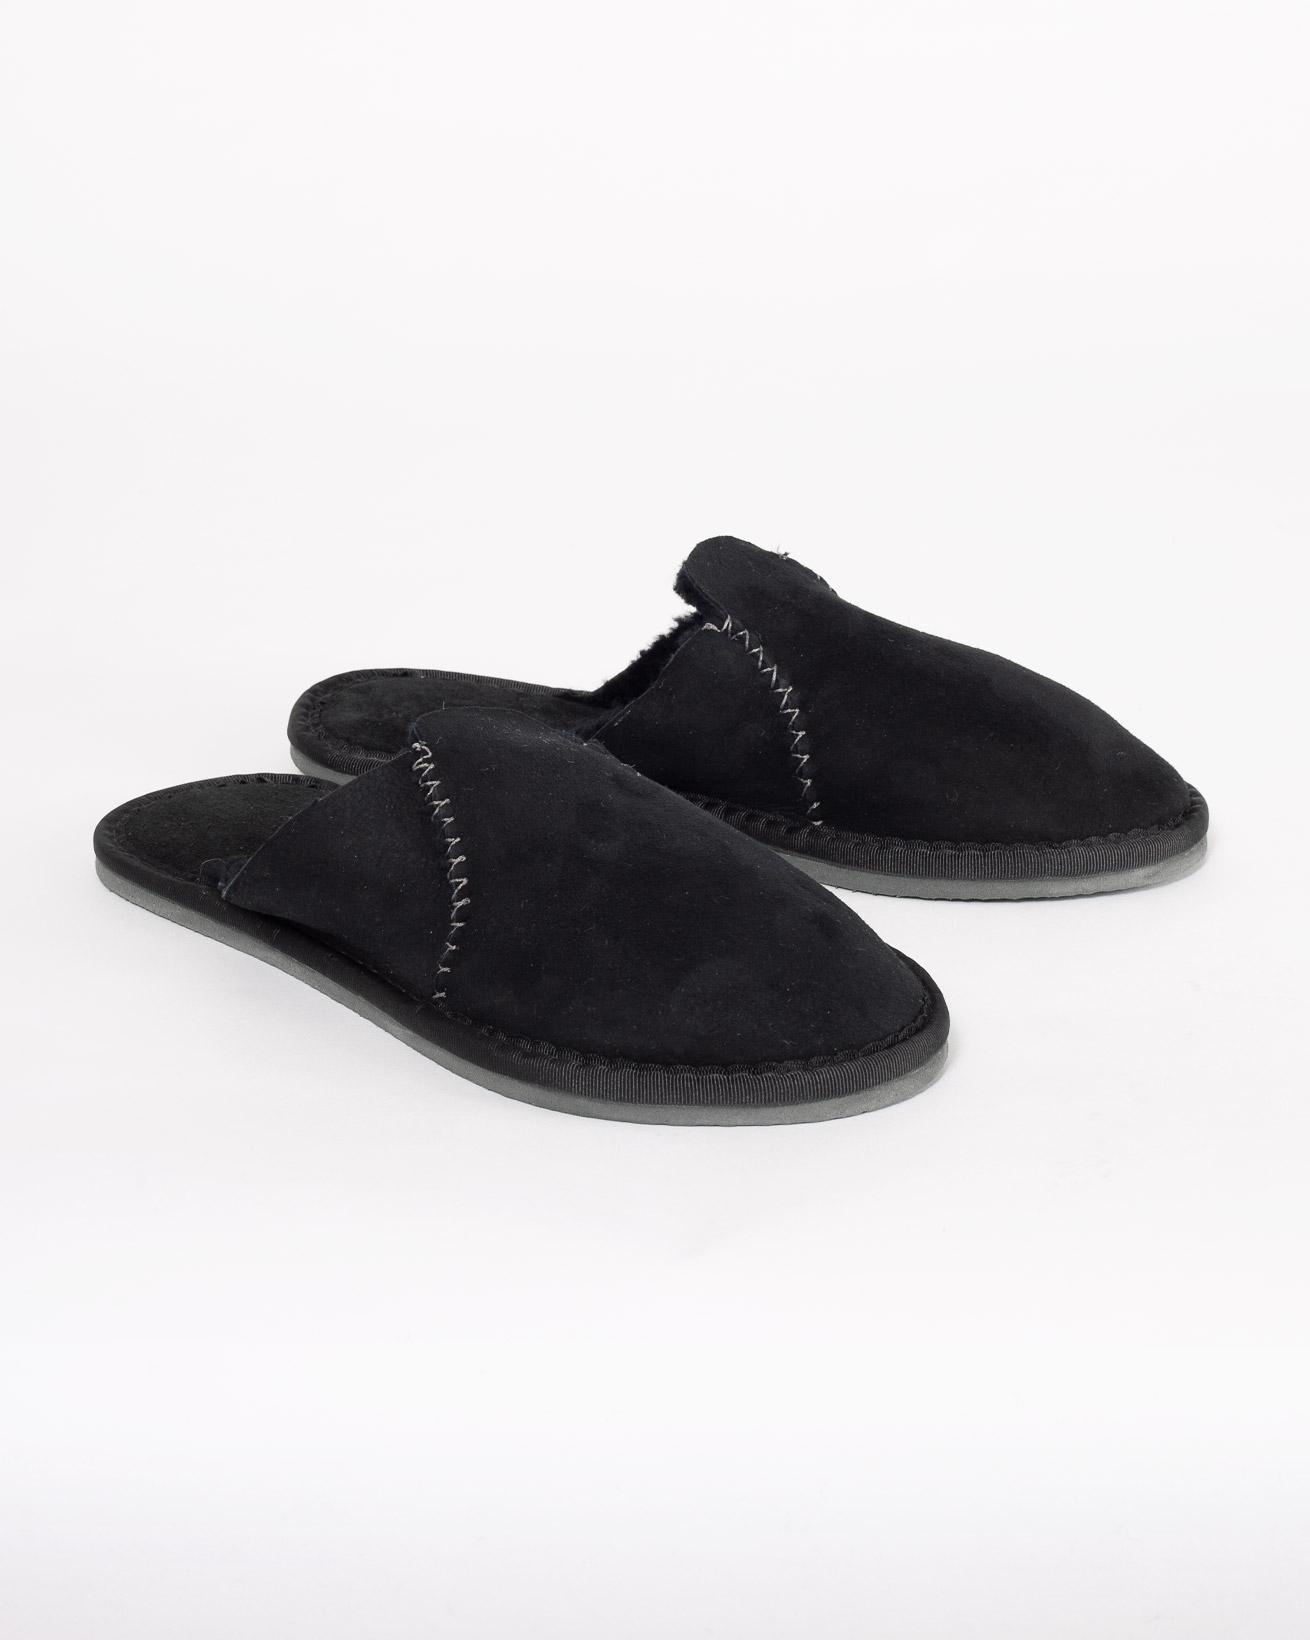 Sheepskin Moccasin Mules - Size 5 - Black - 1003